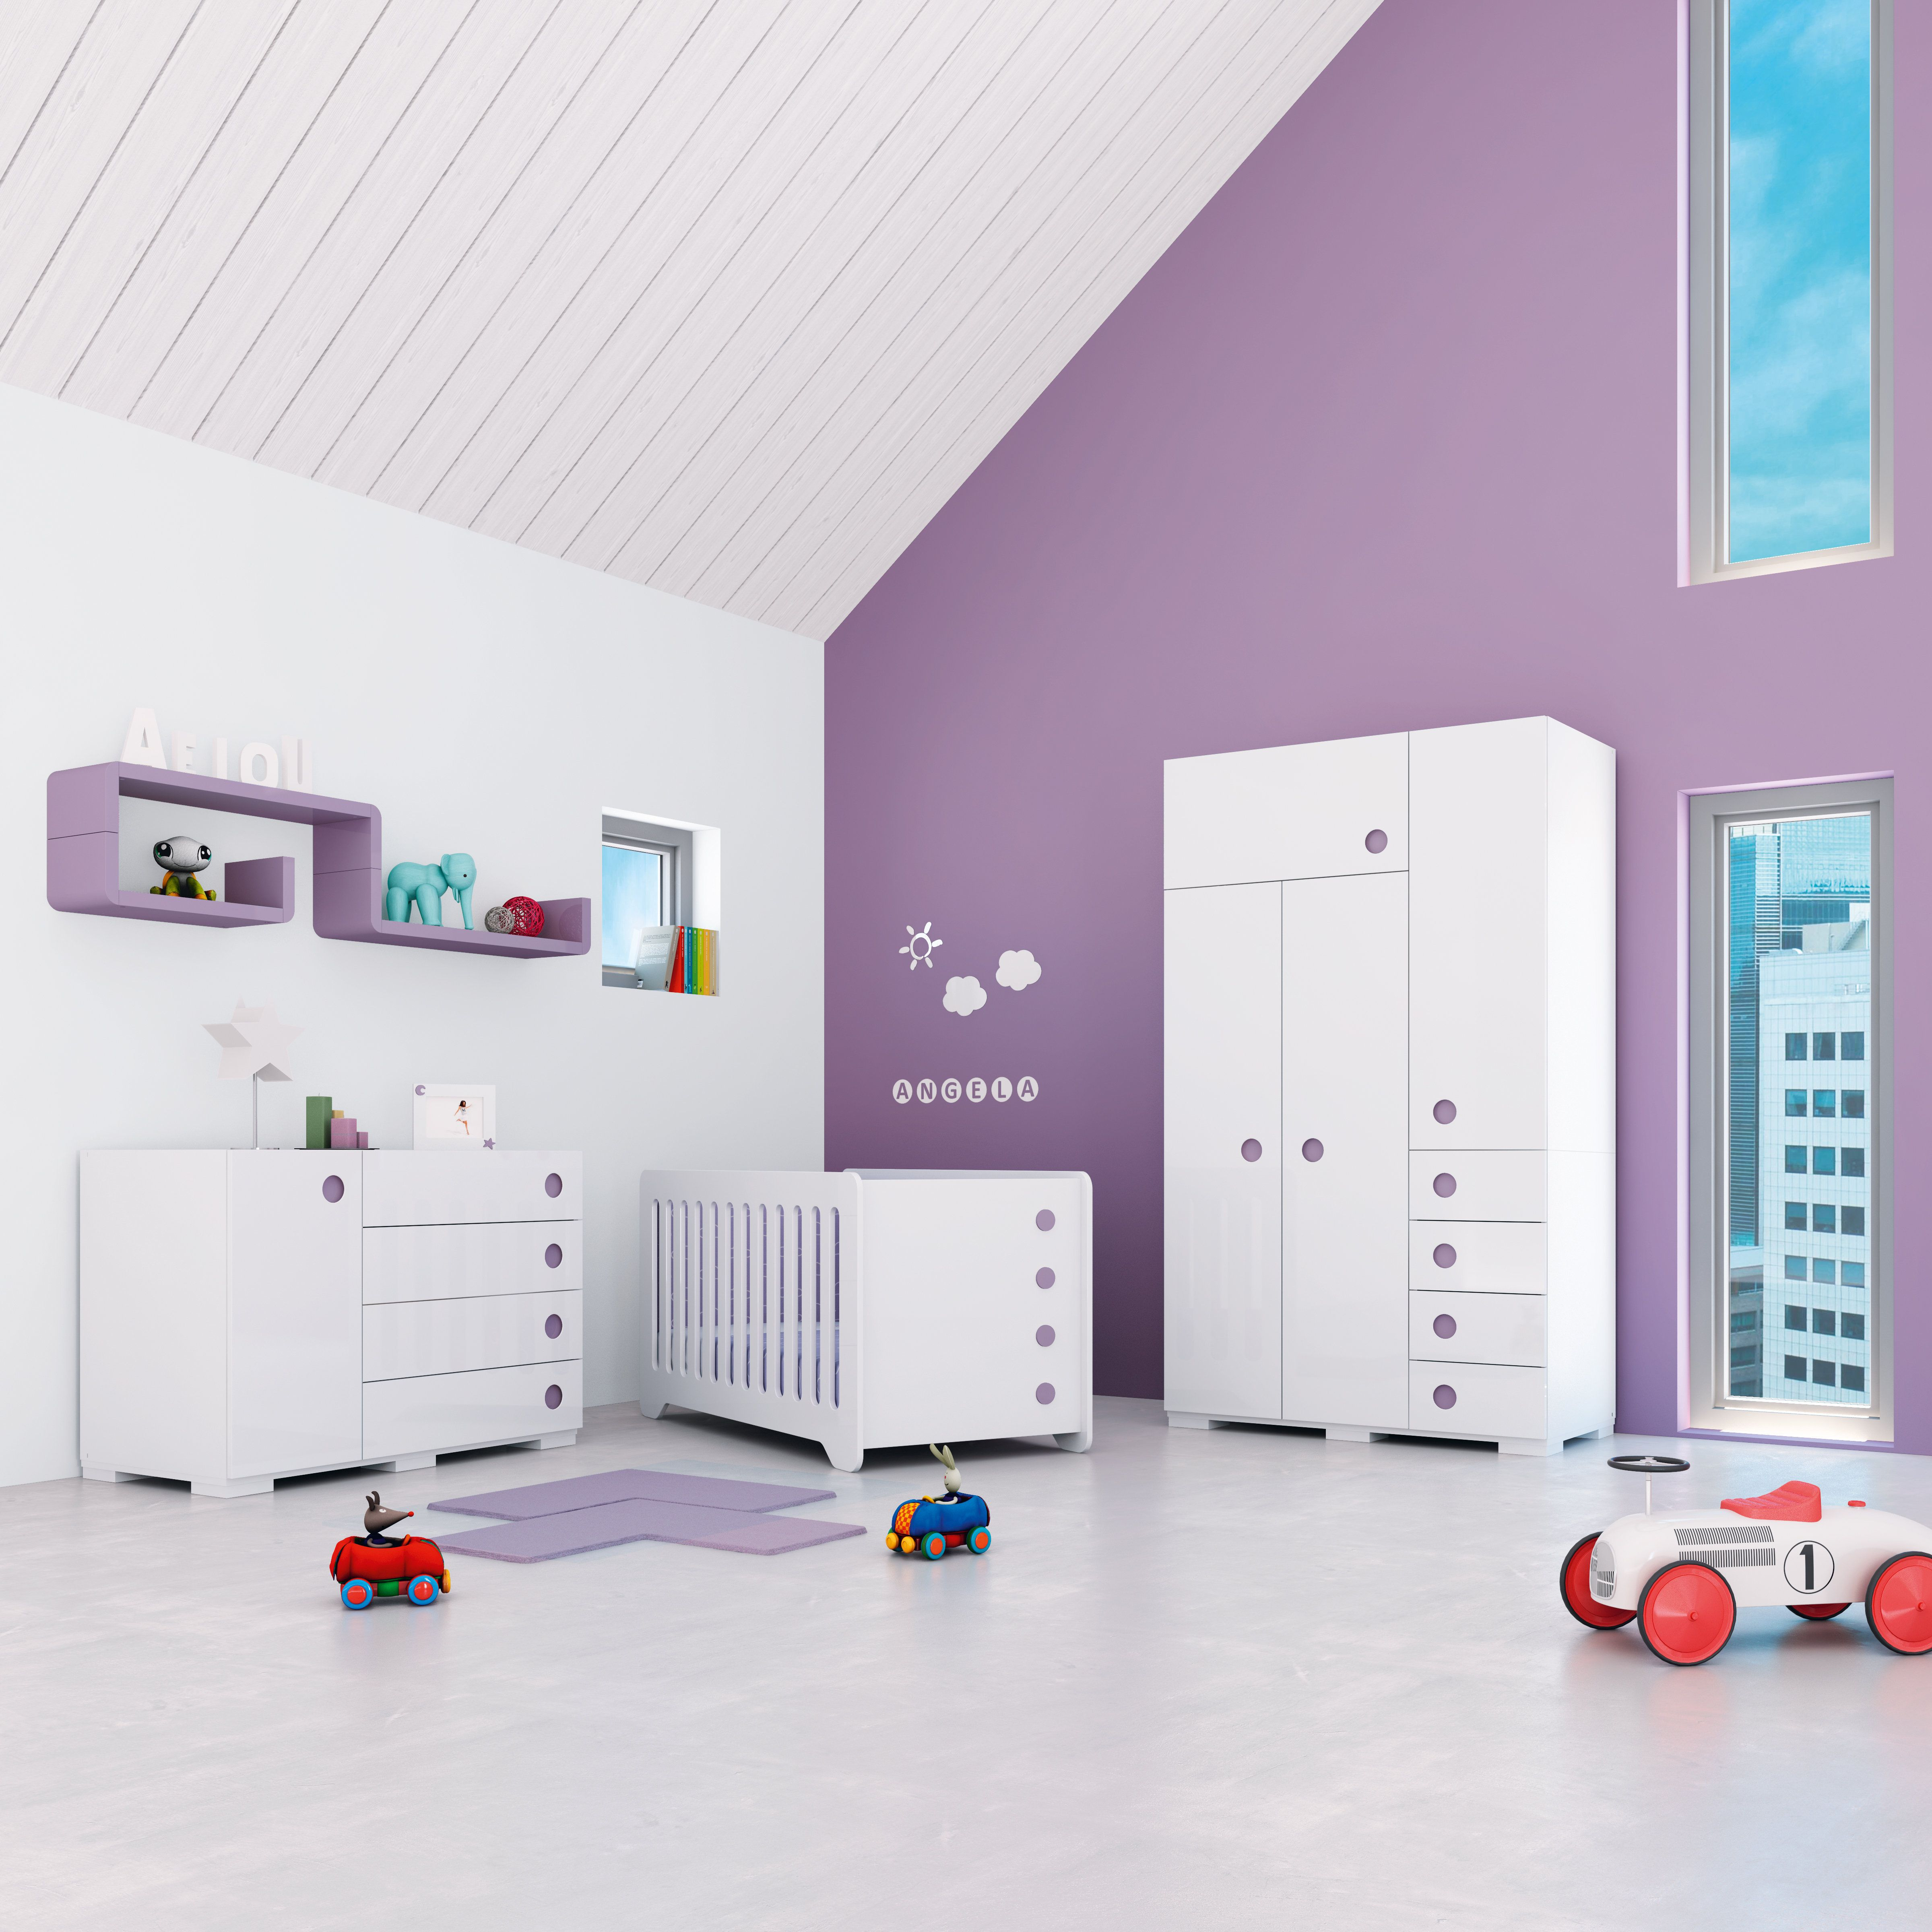 Habitaciones infantiles de dise o color lila para beb s for Diseno de habitaciones infantiles